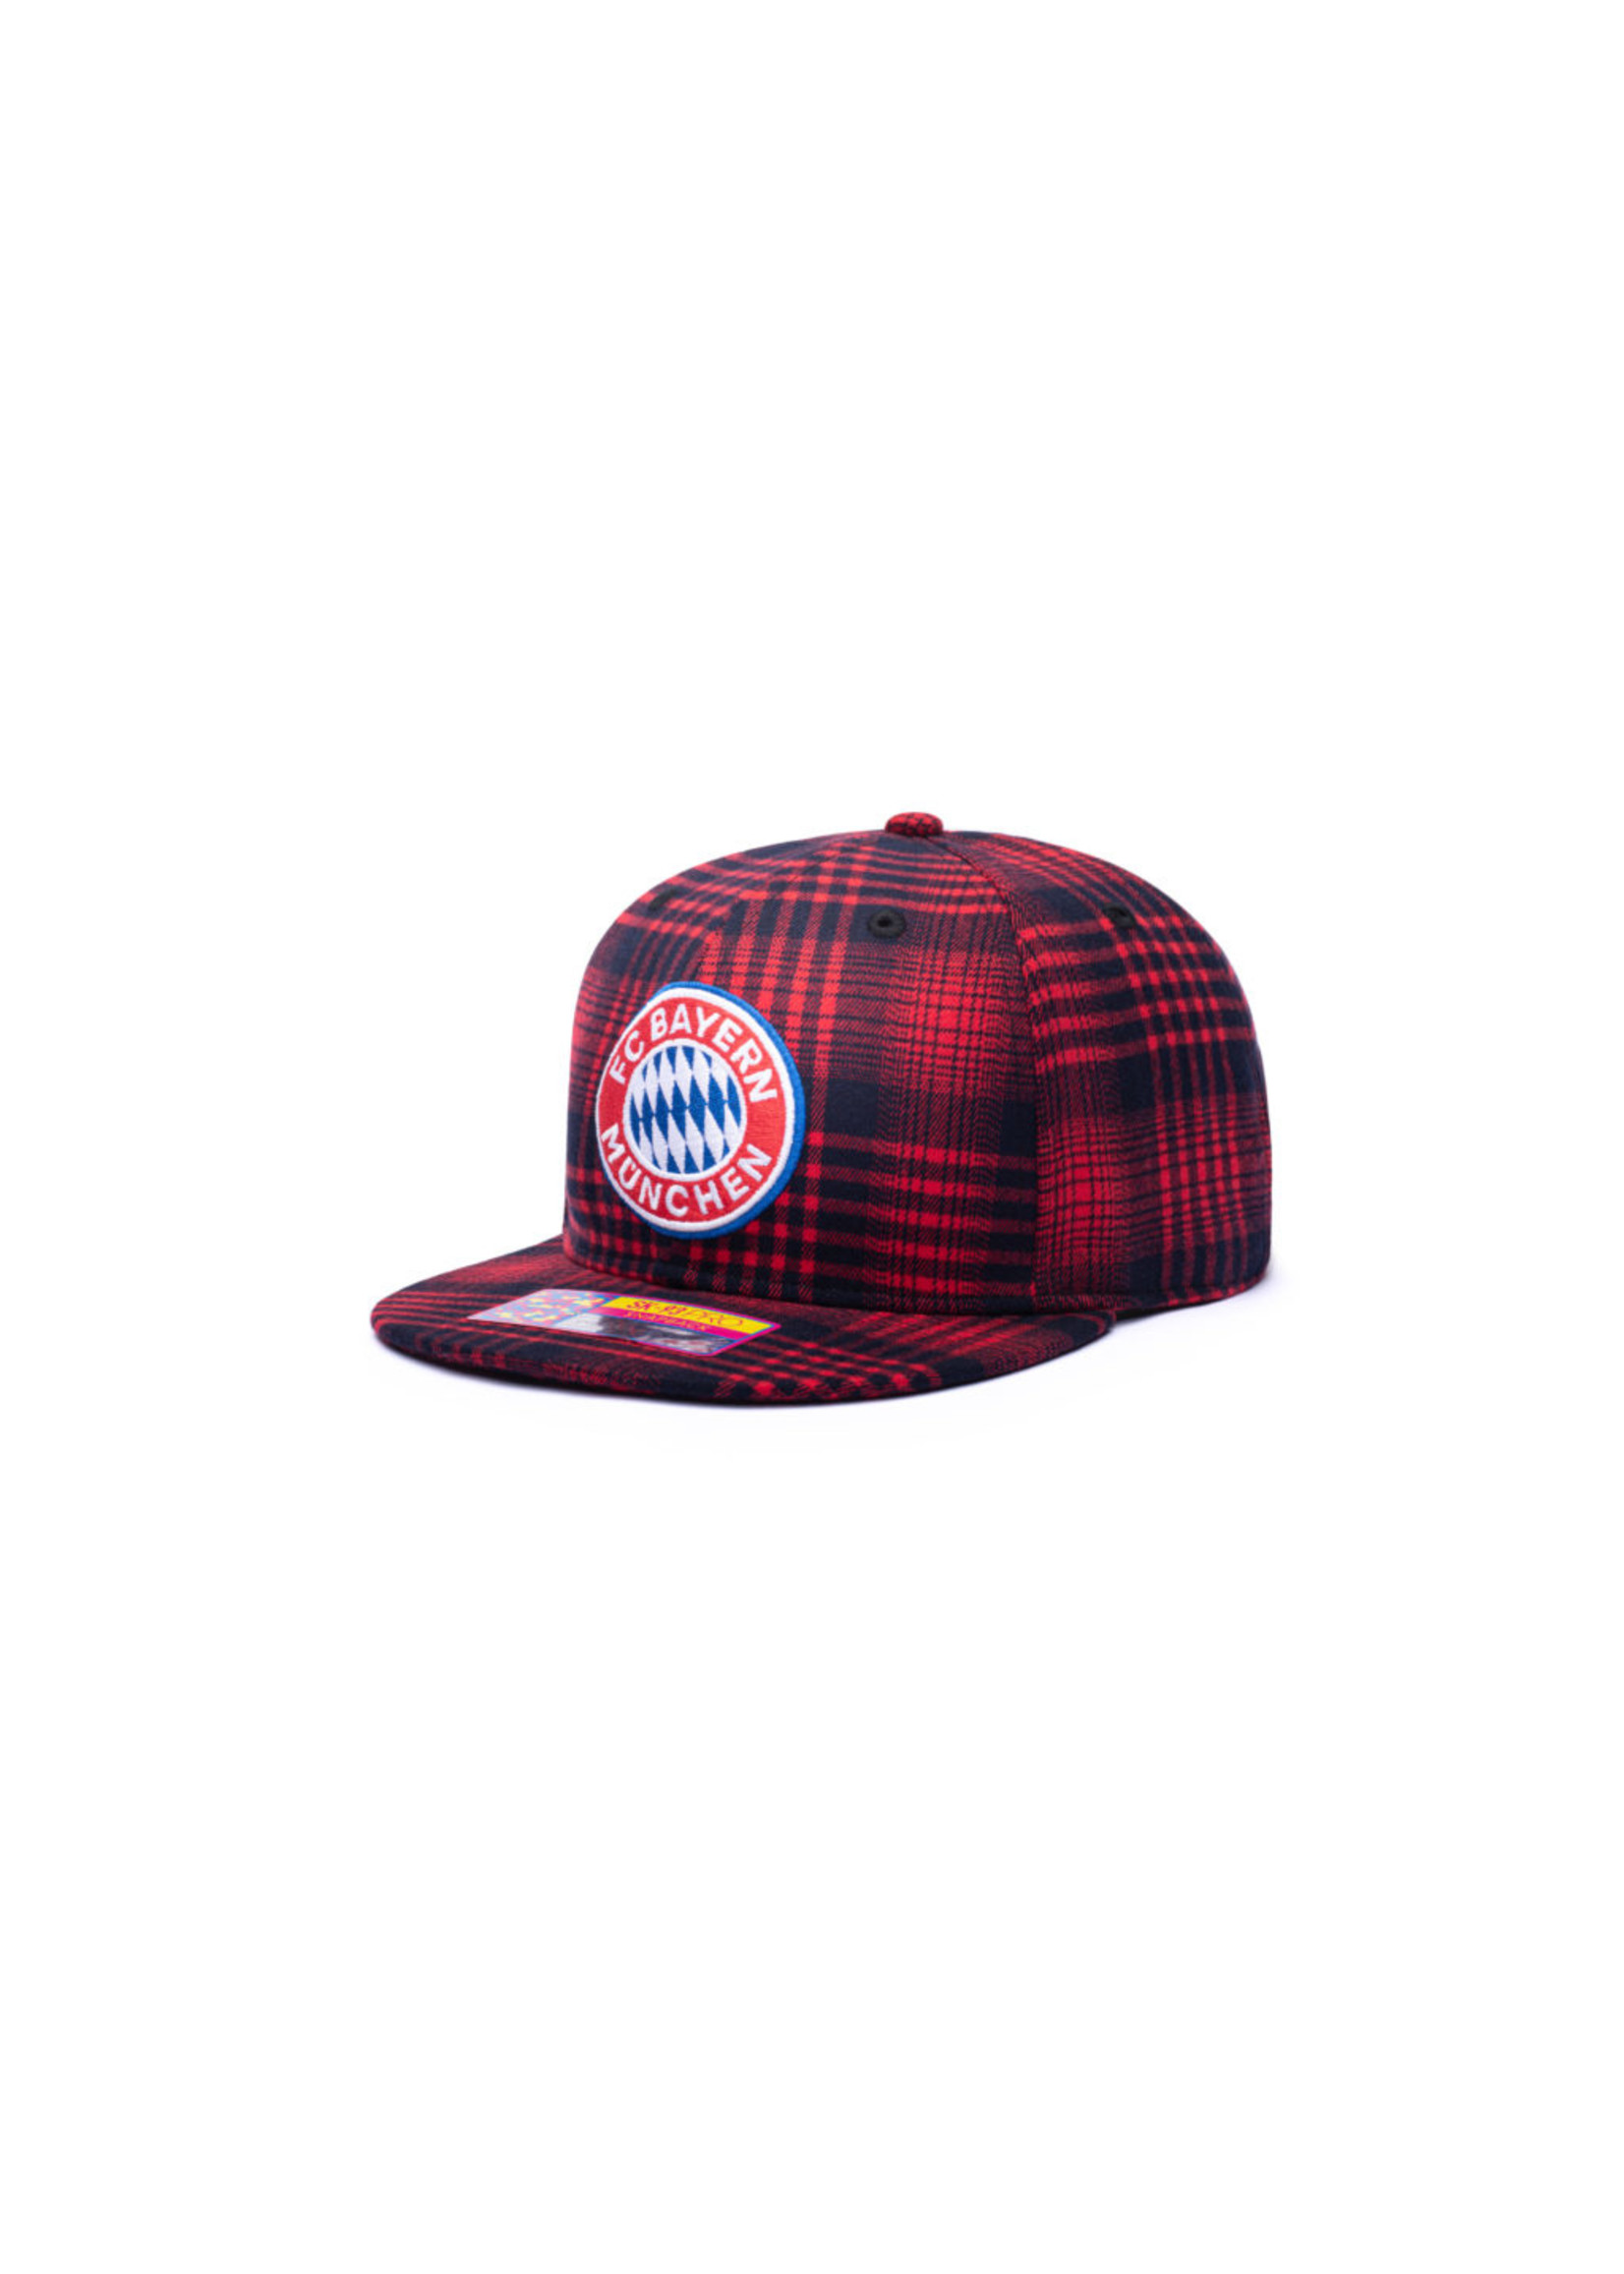 Bayern Munich Hooligan Snapback